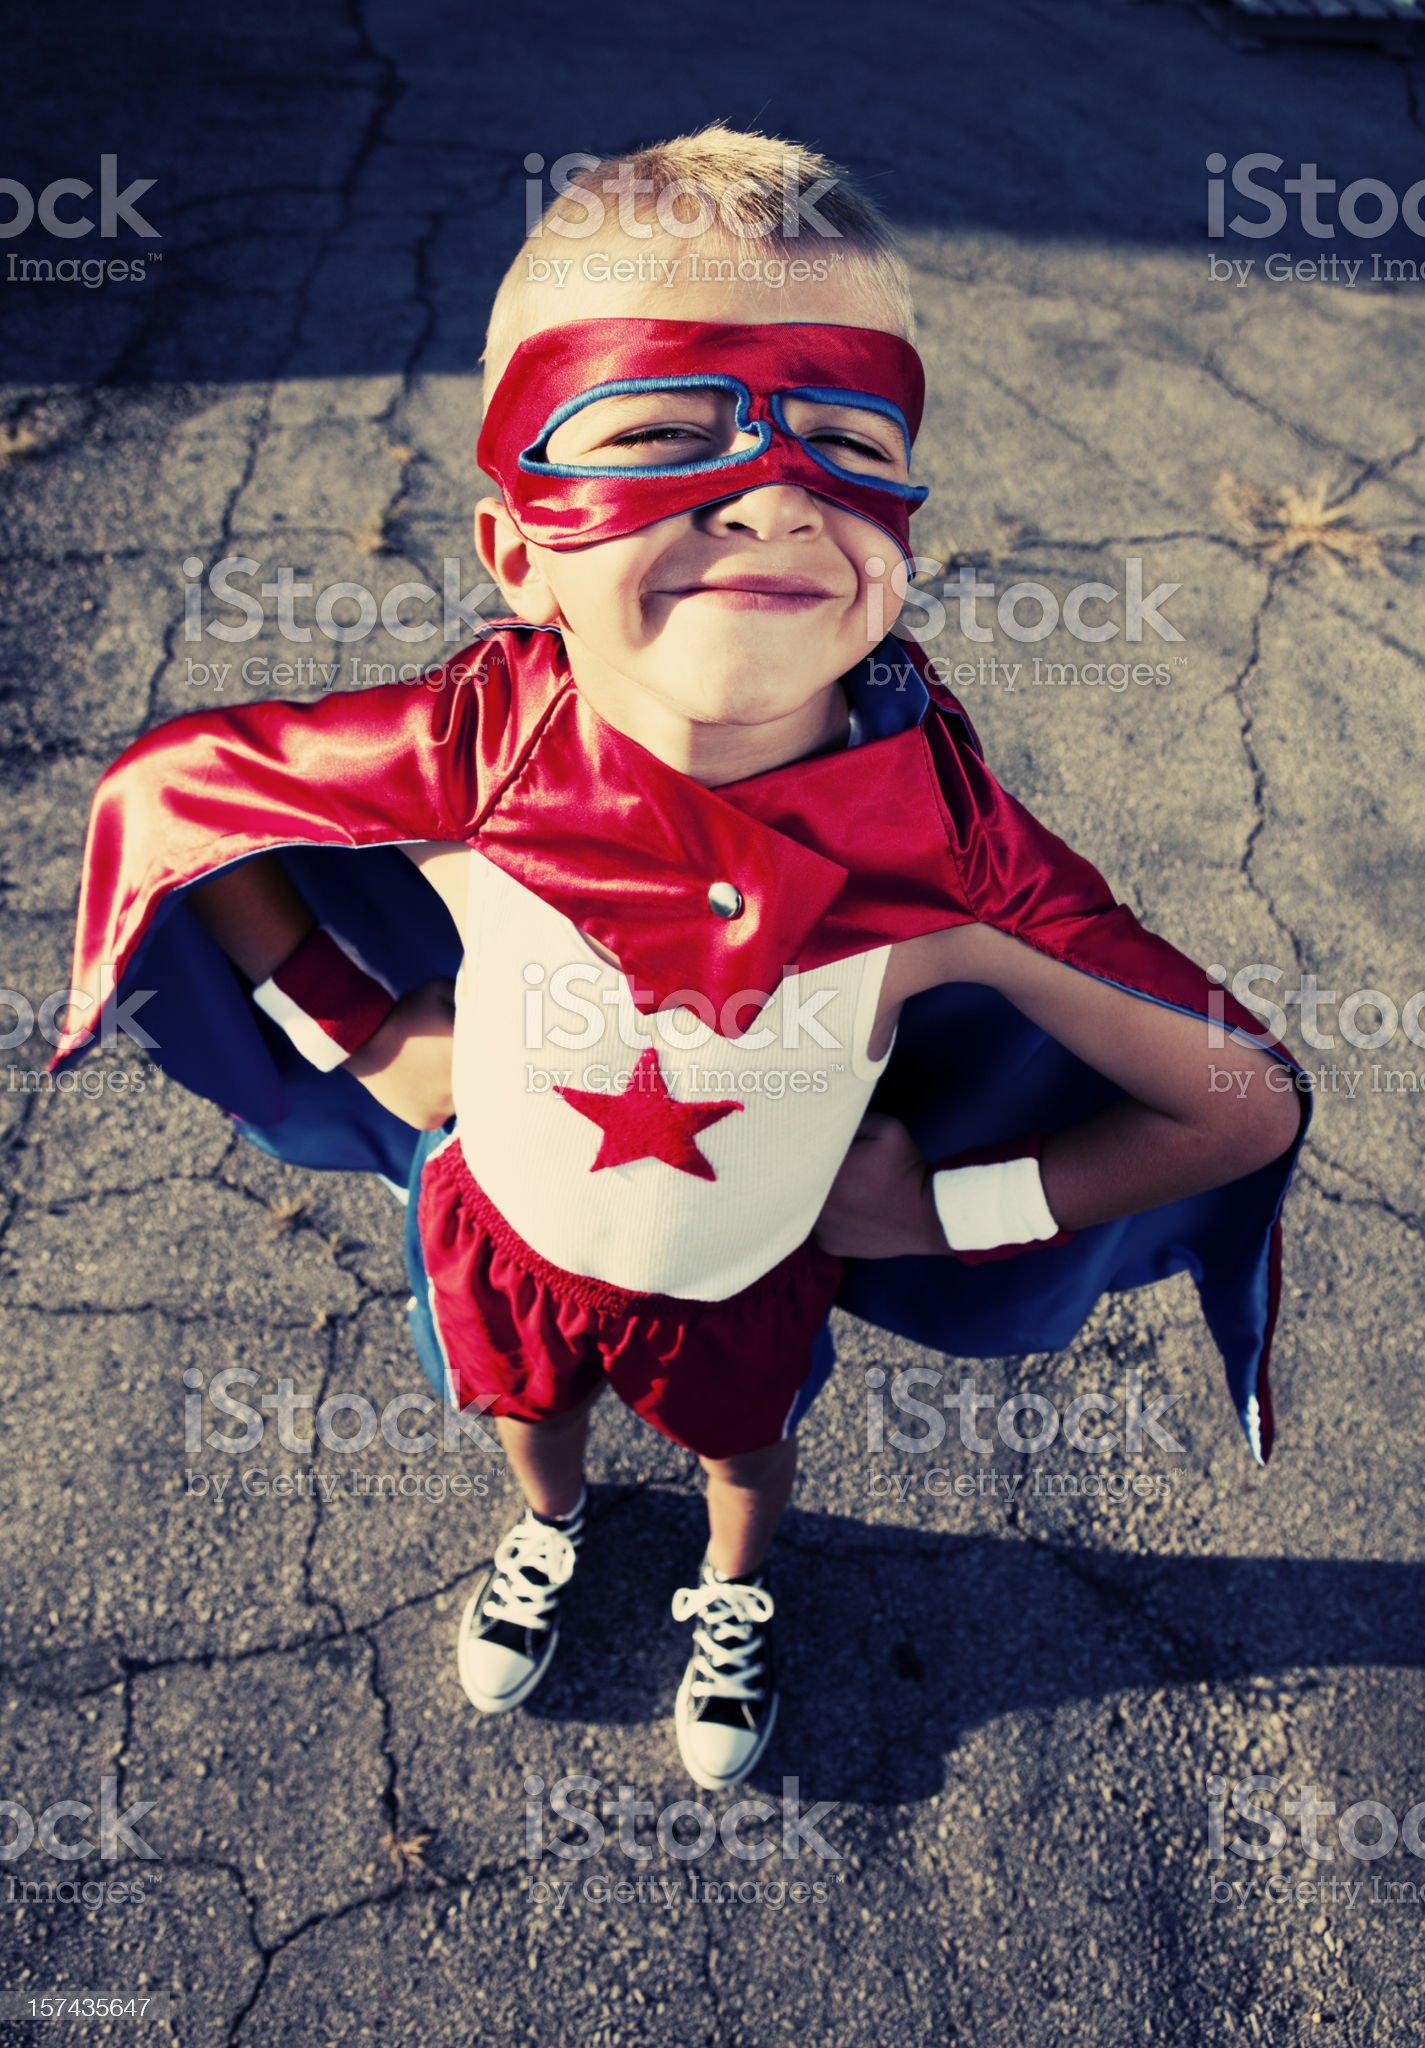 Young Boy Dressed as Superhero Smiles on Blacktop royalty-free stock photo